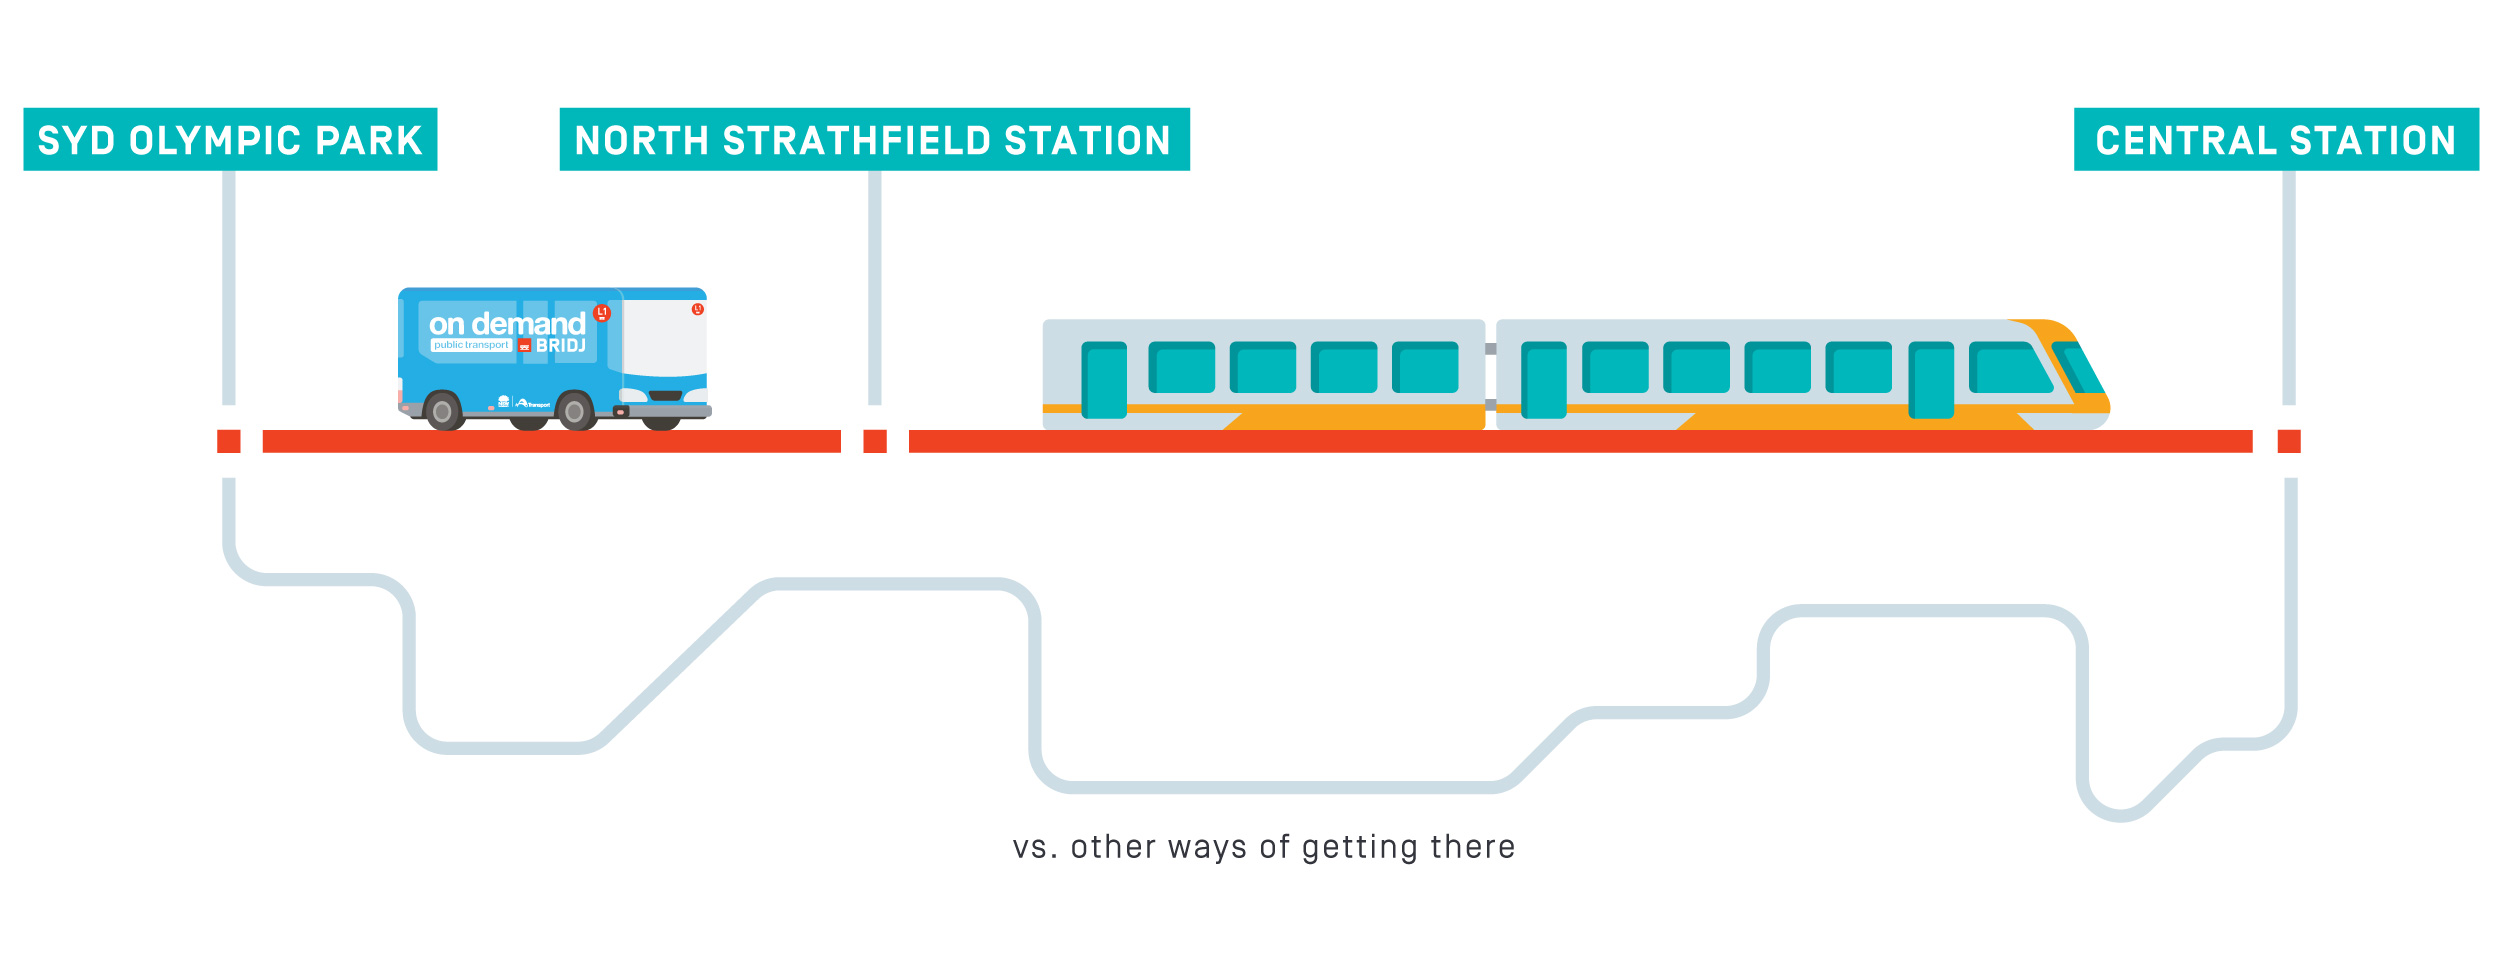 SydneyOlympicPark_Diagram.jpg